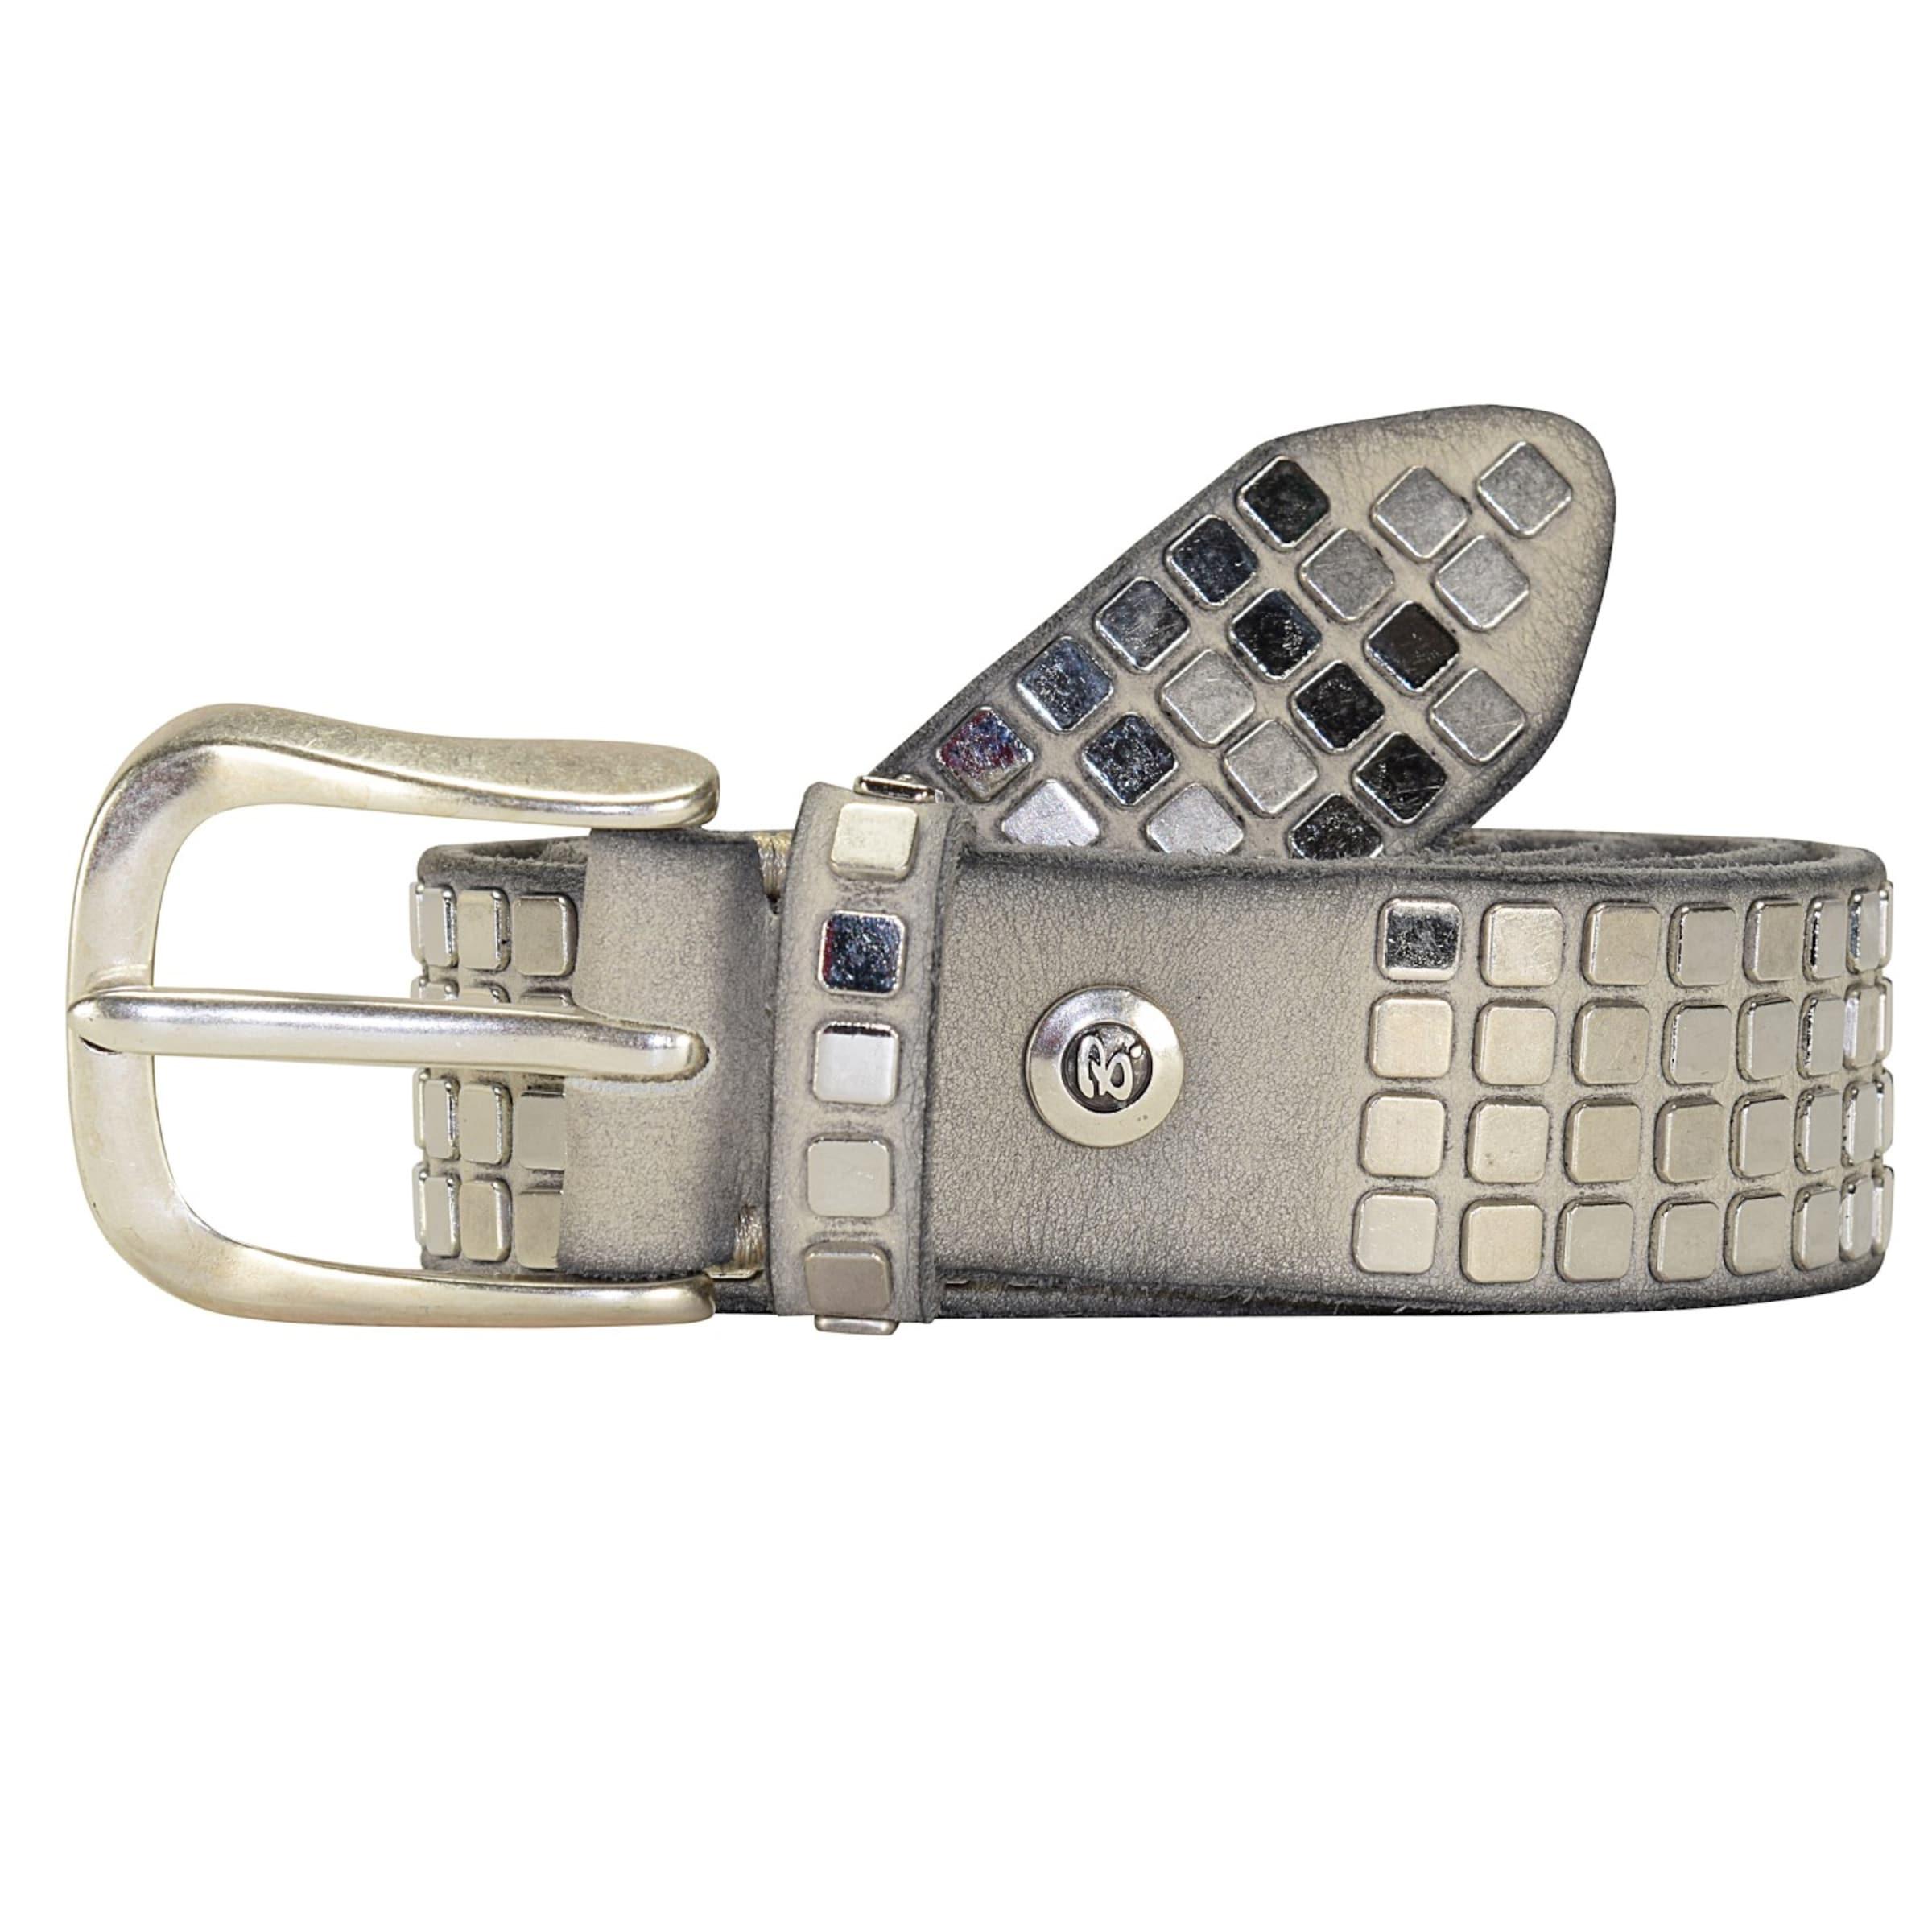 b.belt Handmade in Germany Gürtel 100 cm Niedriger Versand Zum Verkauf OoYr5s